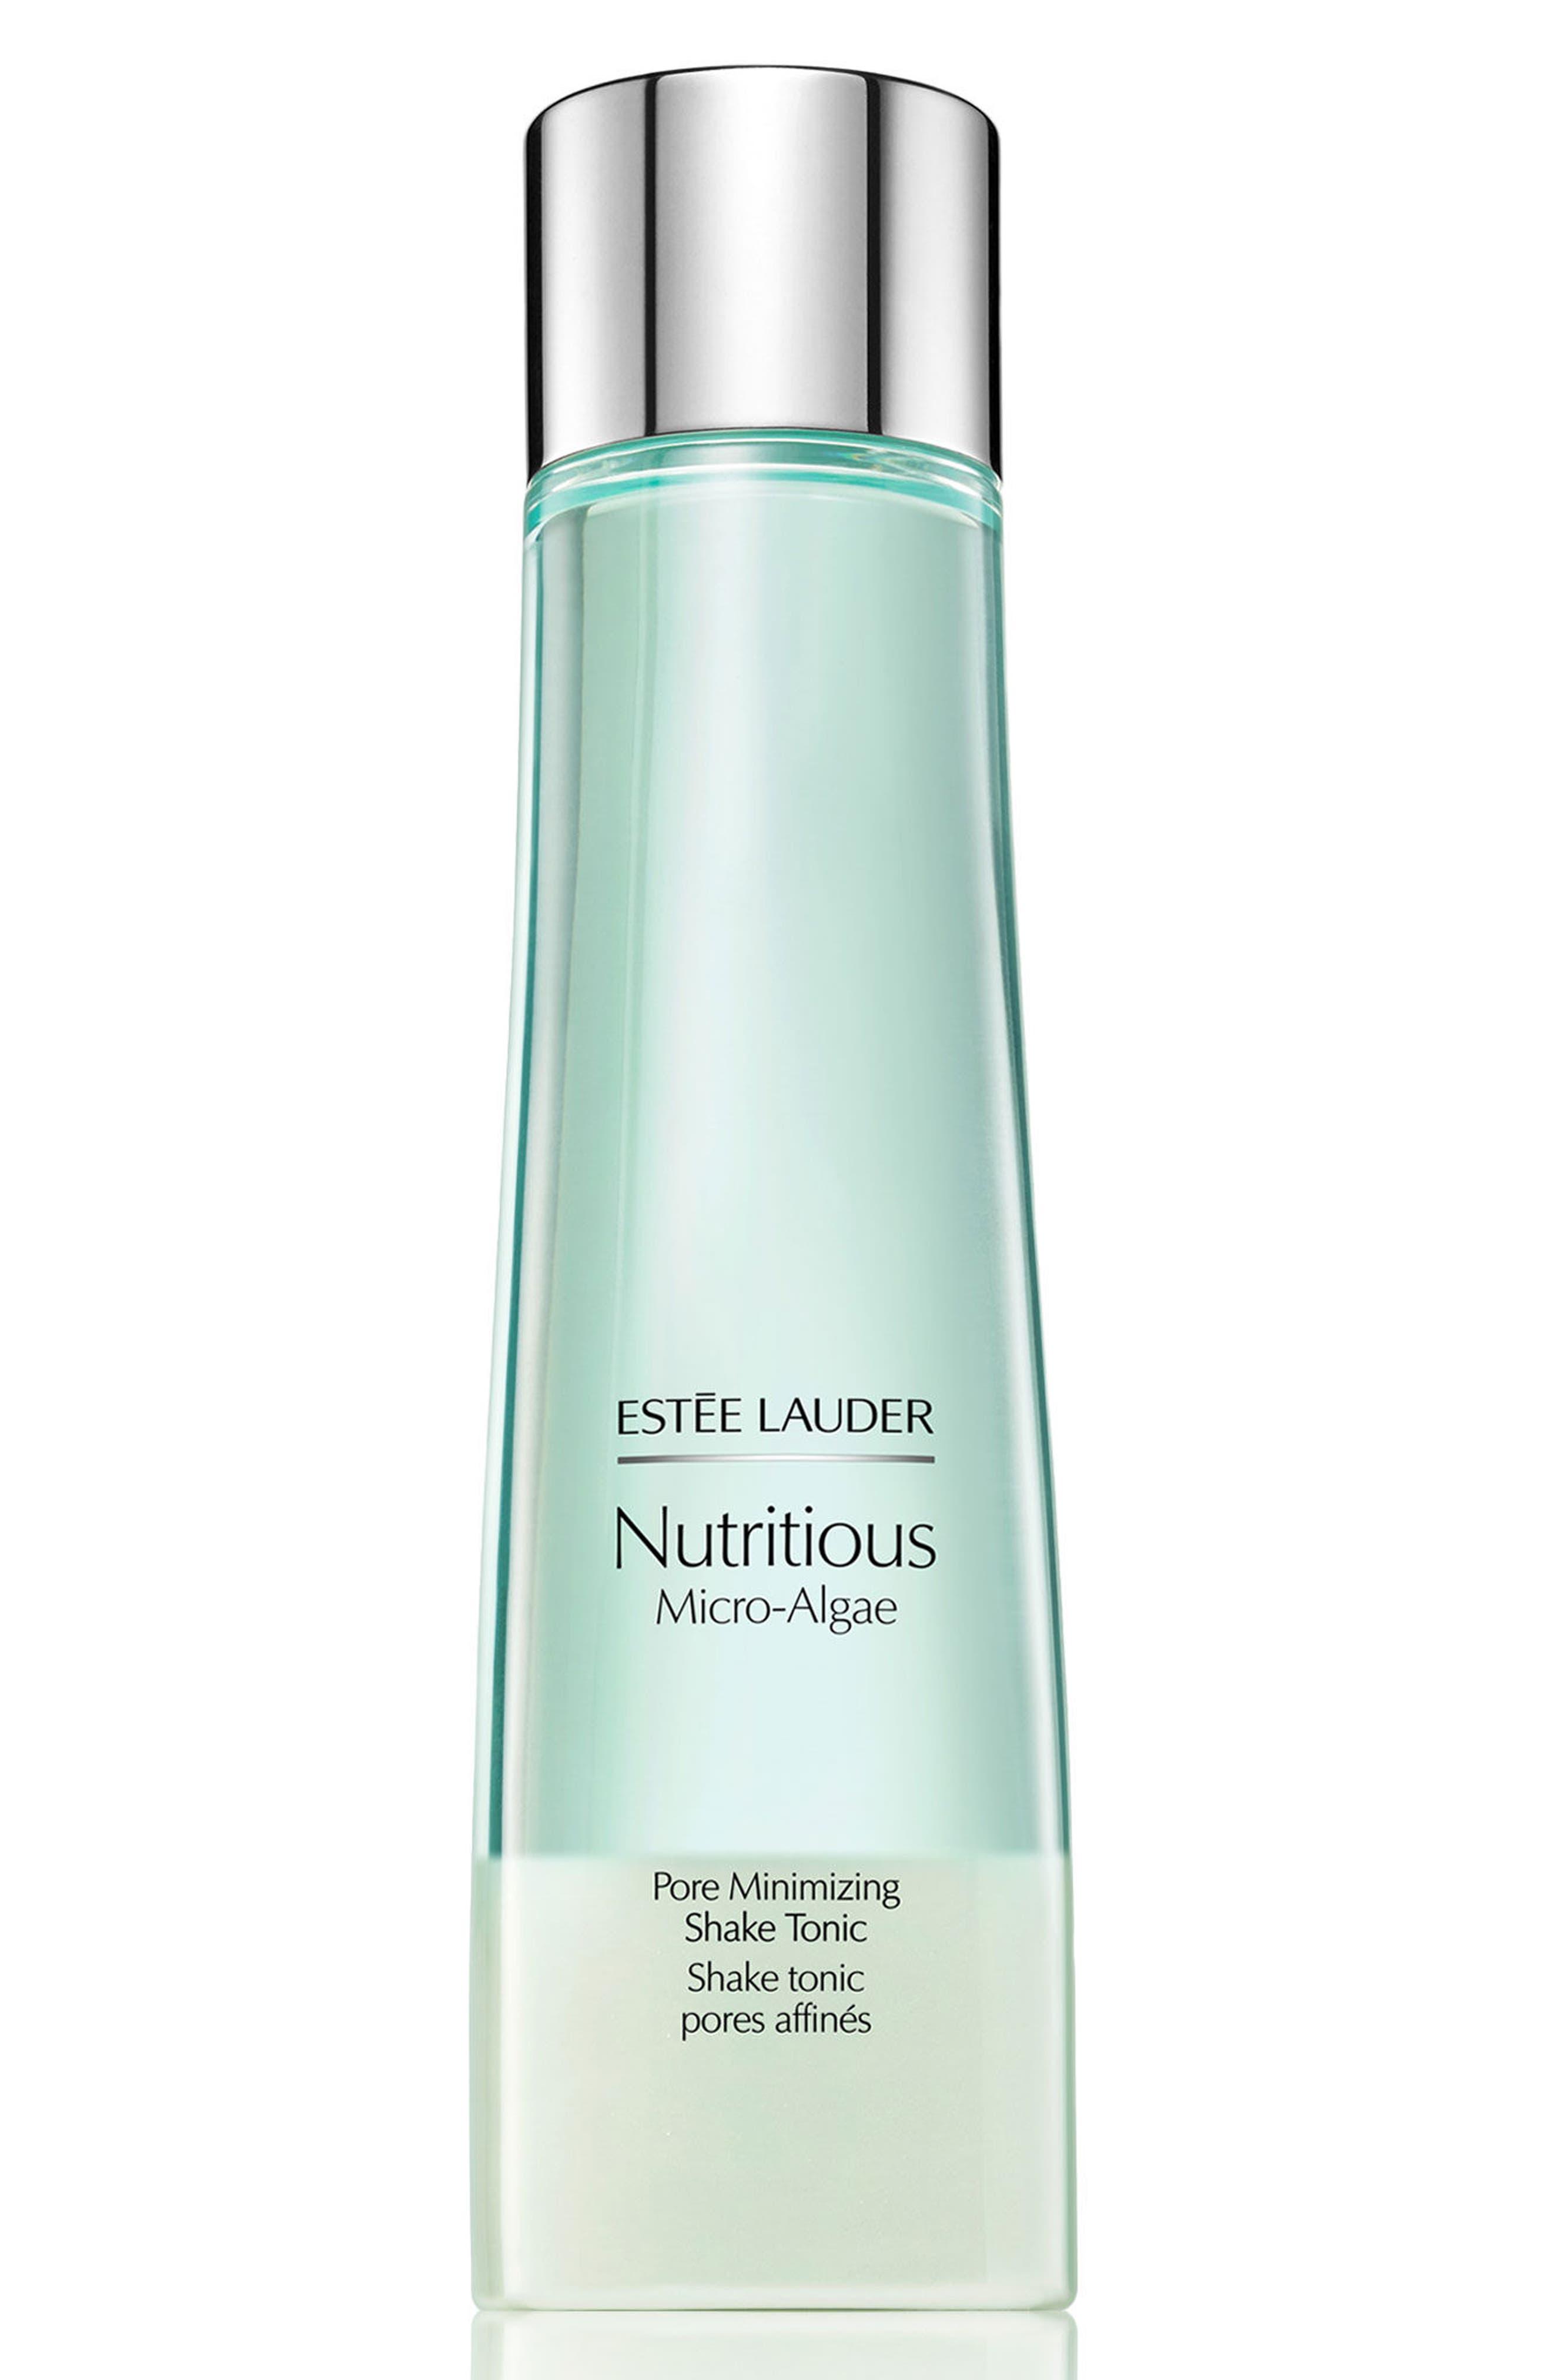 ESTÉE LAUDER, Nutritious Micro-Algae Pore Minimizing Shake Tonic, Main thumbnail 1, color, NO COLOR